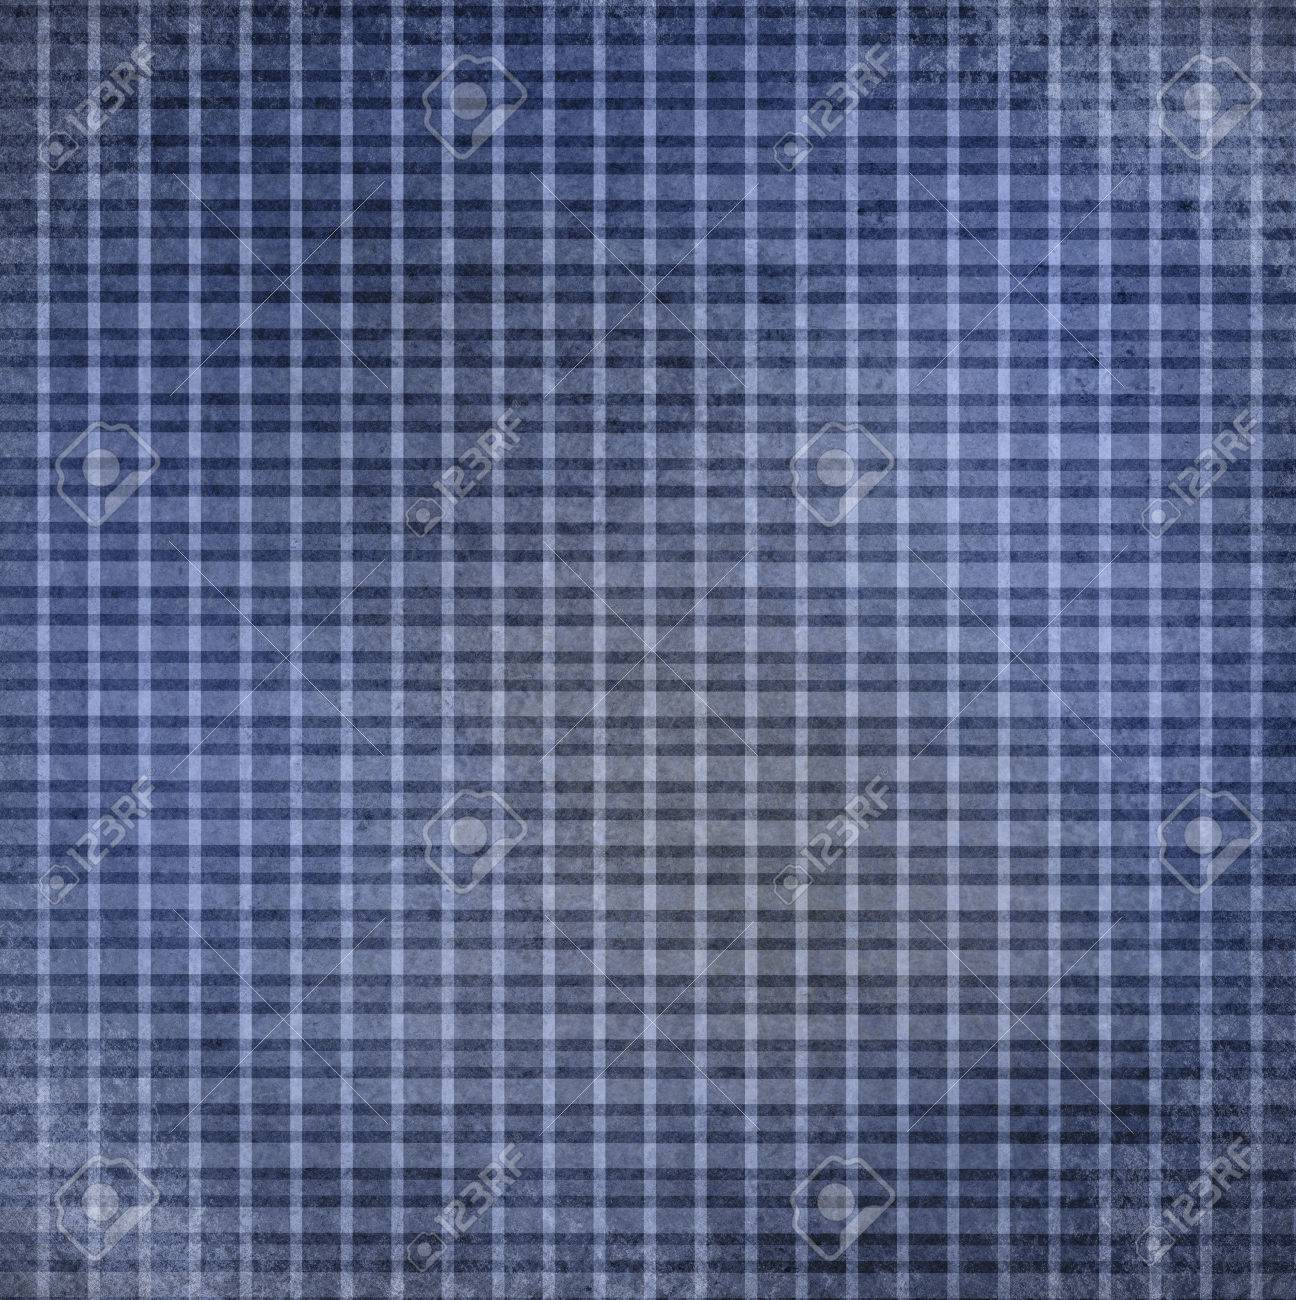 9af58ae957 Desvanecido De Cosecha De Fondo Azul A Cuadros